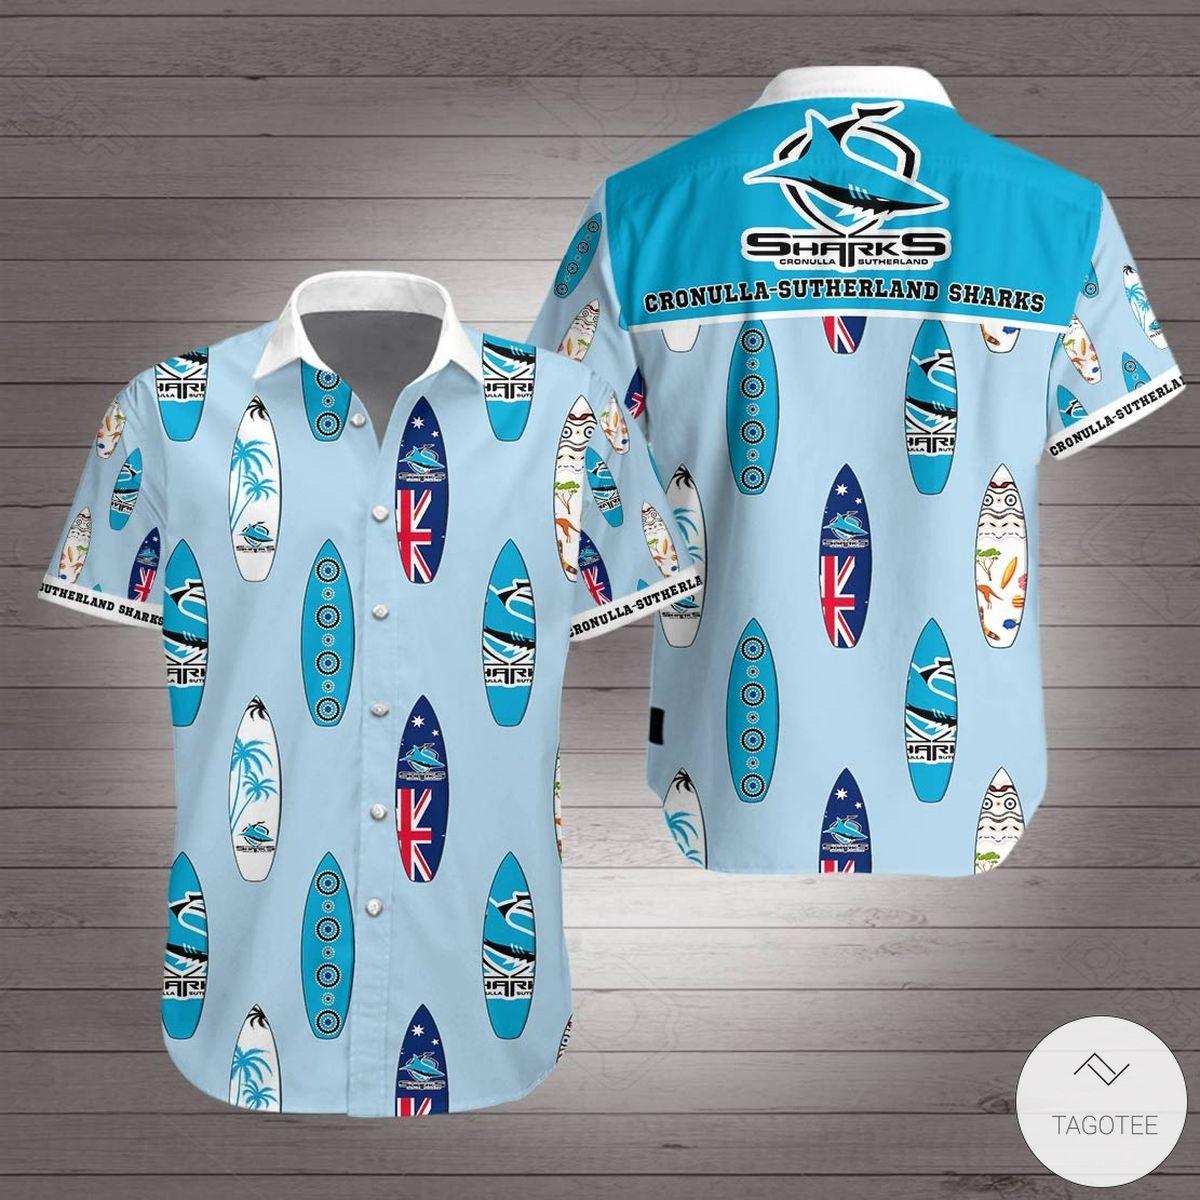 Cronulla-Sutherland Sharks Hawaiian Shirt